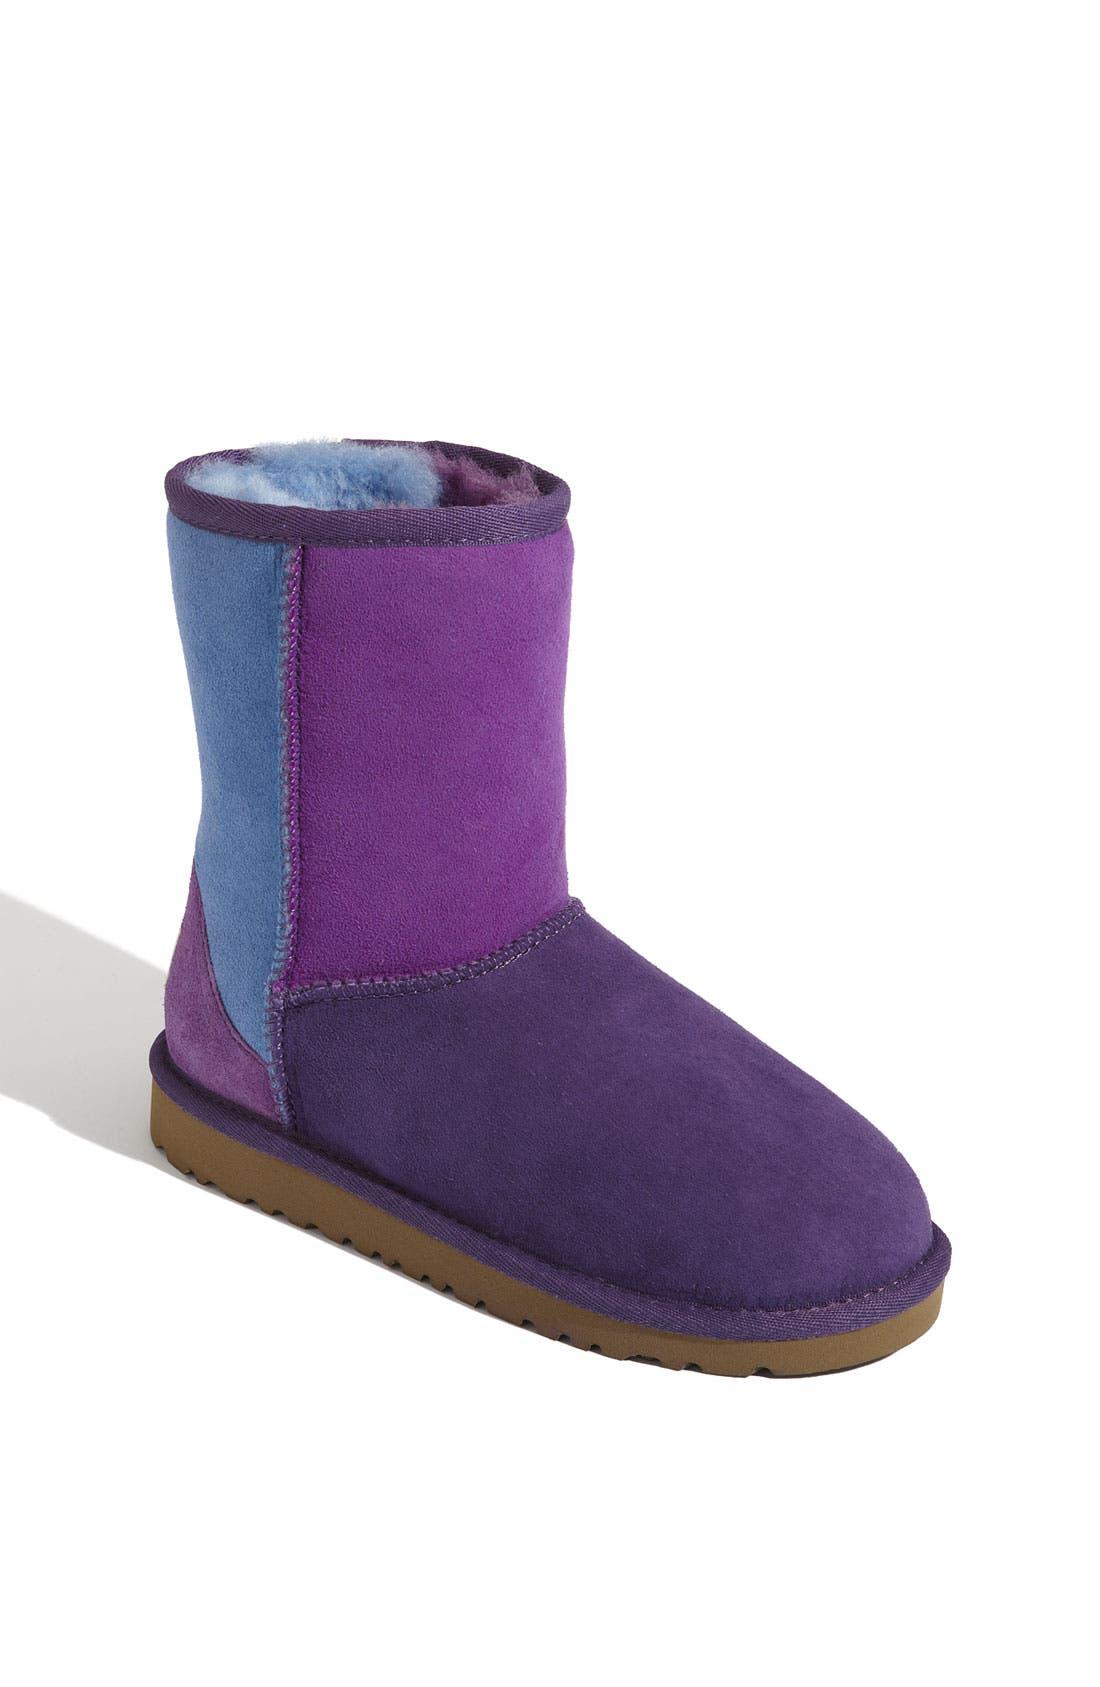 Alternate Image 1 Selected - UGG® 'Classic Short - Patchwork' Boot (Walker)